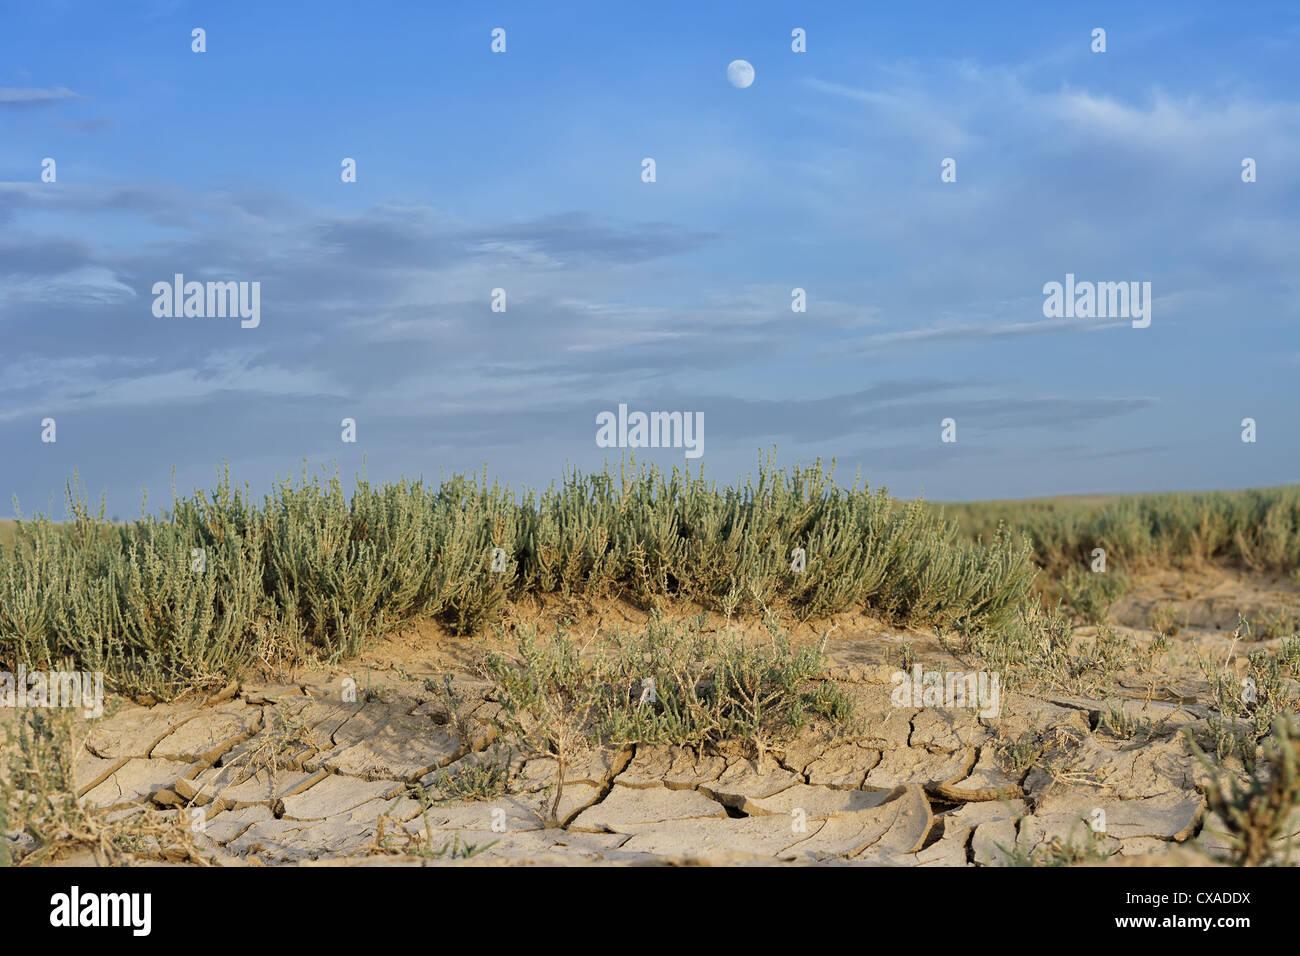 Las zonas áridas, fondo azul, Clima, cambio climático, agrietado, desiertas, desecado, desastre, sequía, Imagen De Stock